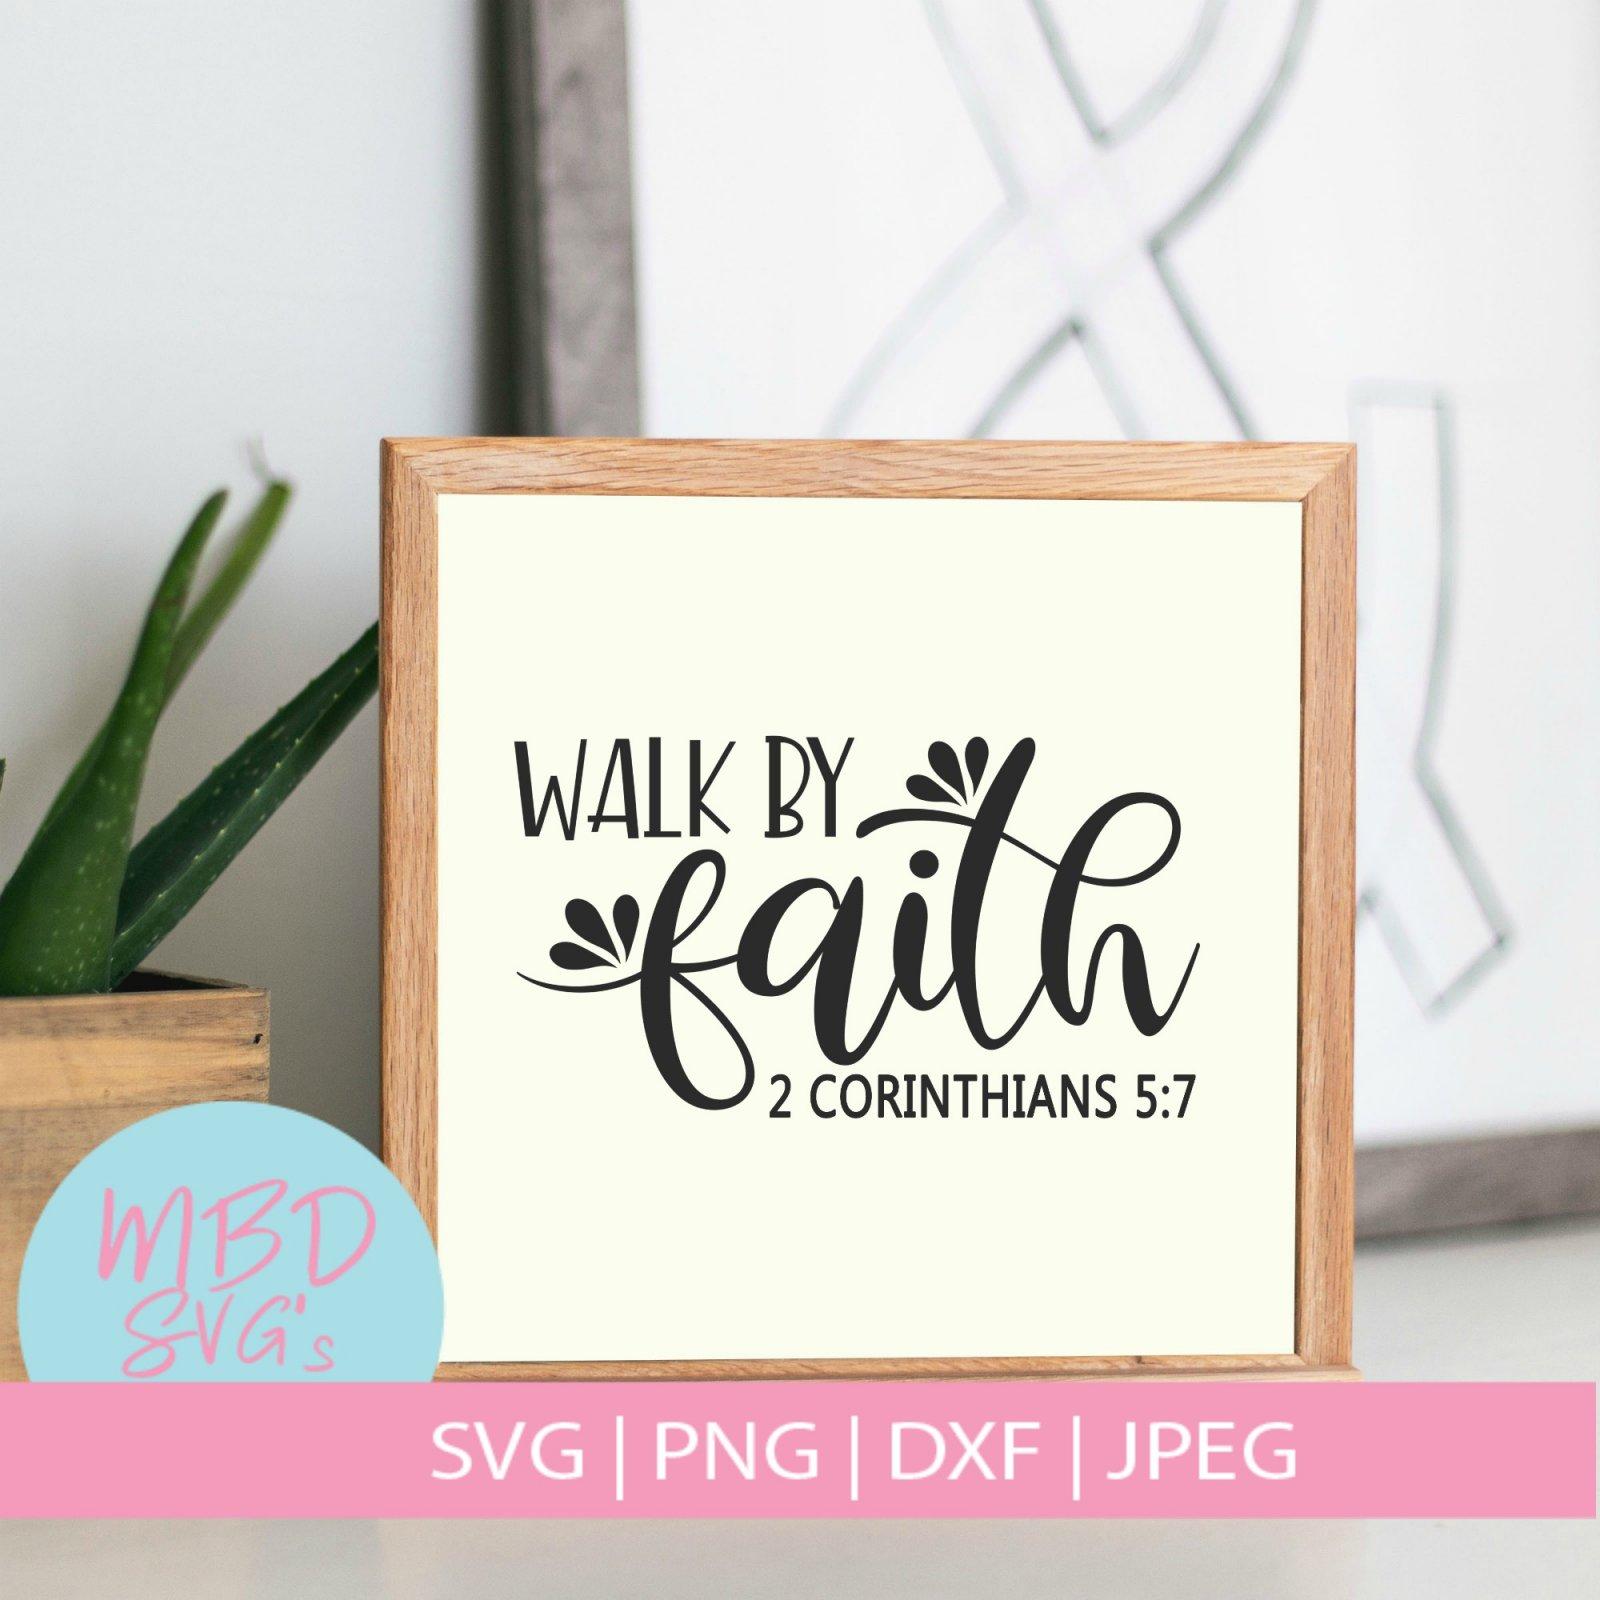 Walk by Faith SVG File for Silhouette or Cricut